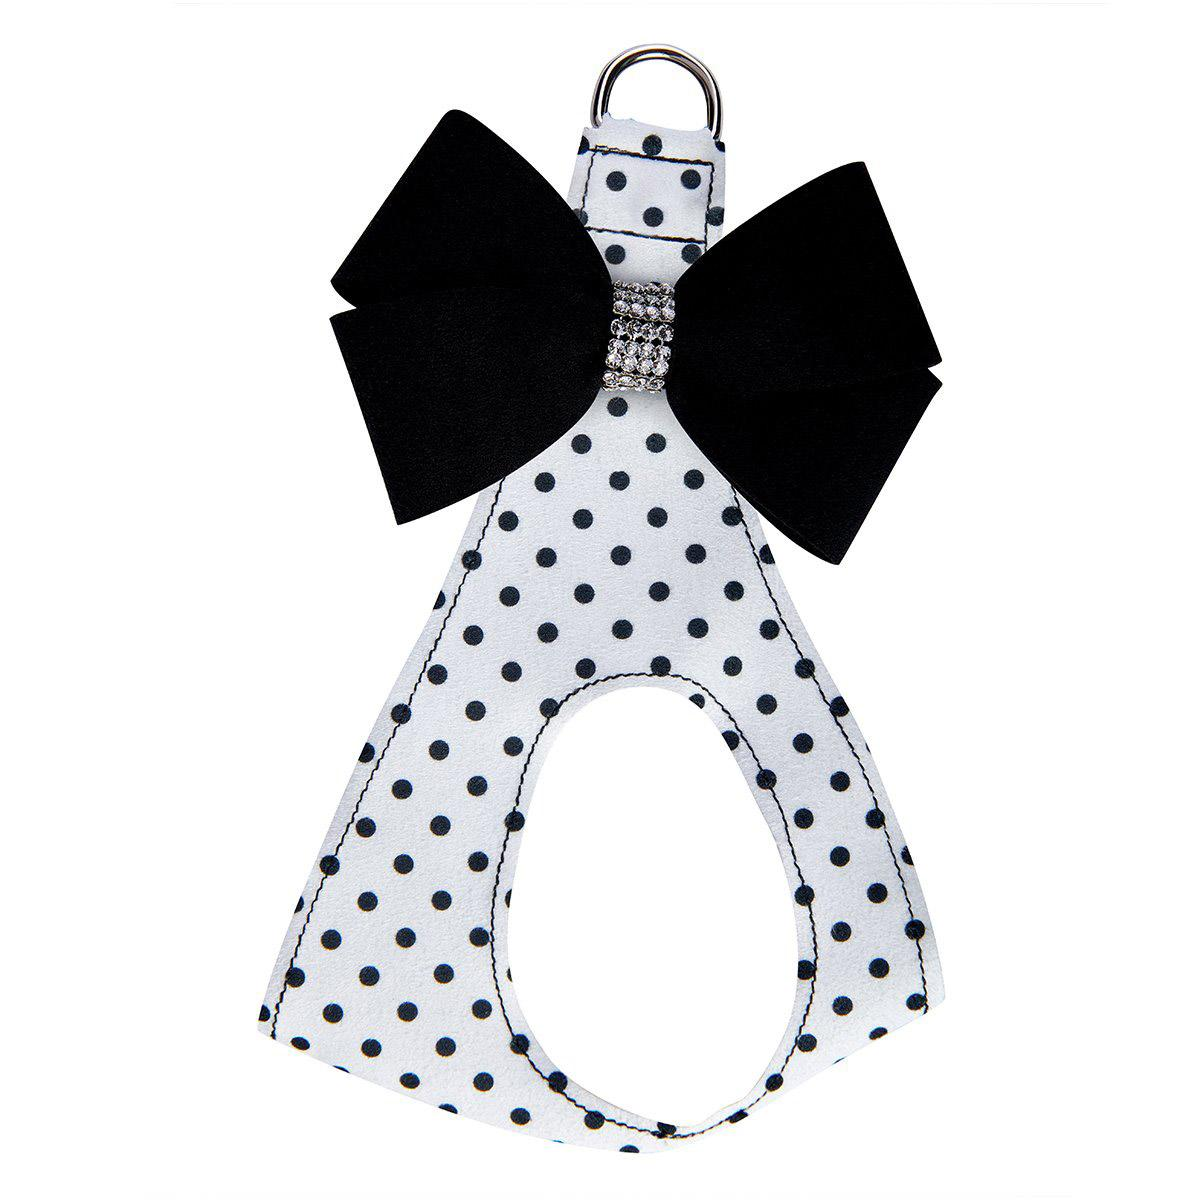 Black & White Nouveau Bow Polka Dot Step-In Dog Harness by Susan Lanci - Black Bow